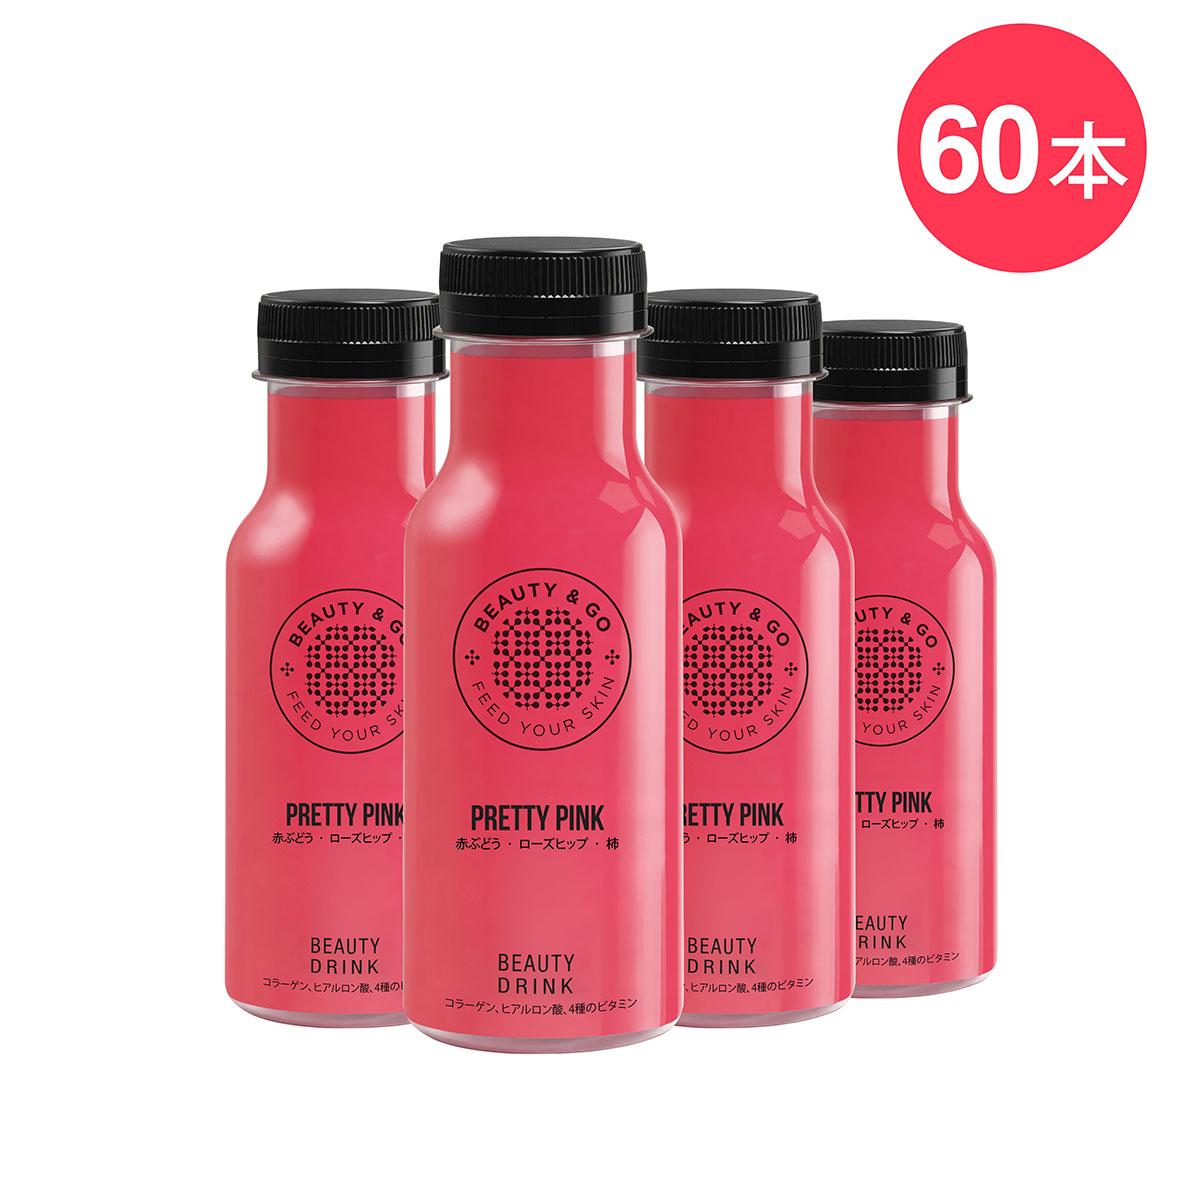 BEAUTYGO PRETTY 人気 おすすめ PINK プリティーピンク 出群 美容ドリンク 60本 ― 60日間のケア